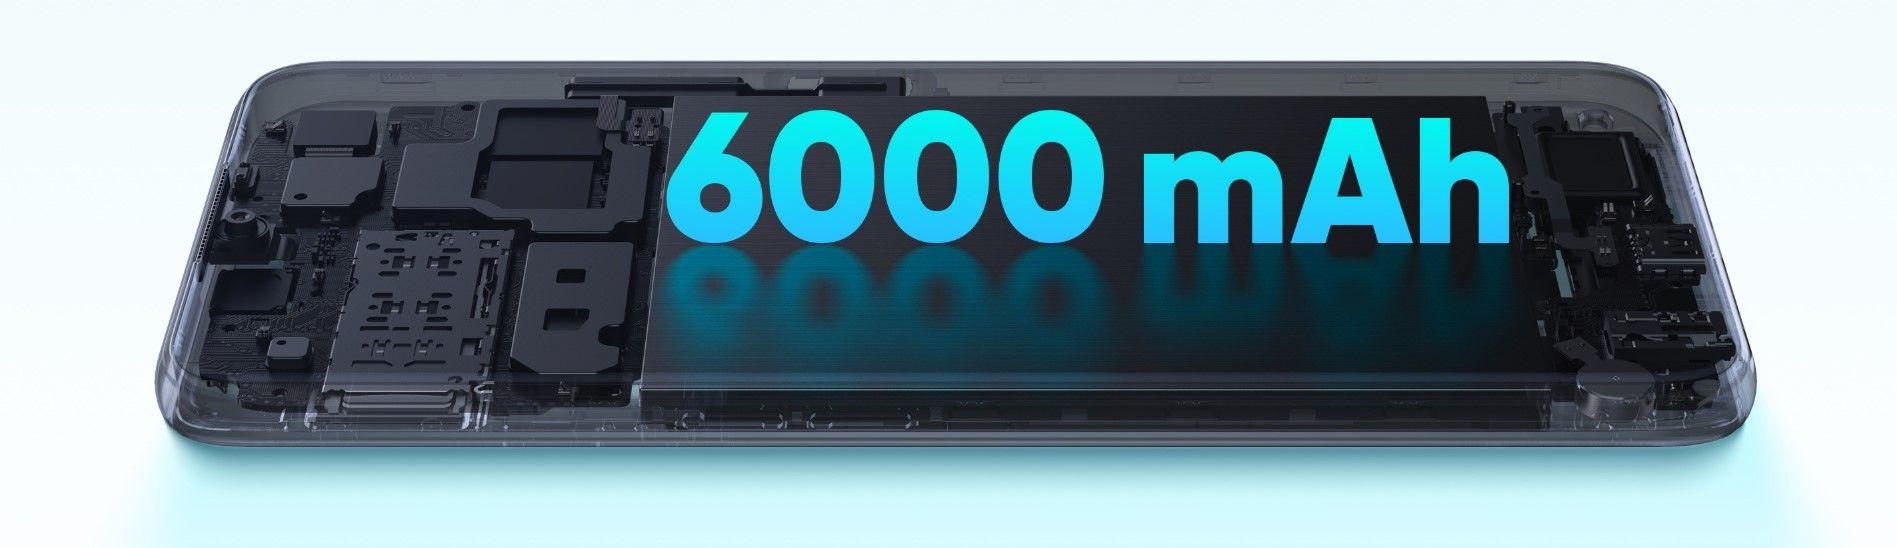 Смартфон Realme C15 автономность 6000 мАч